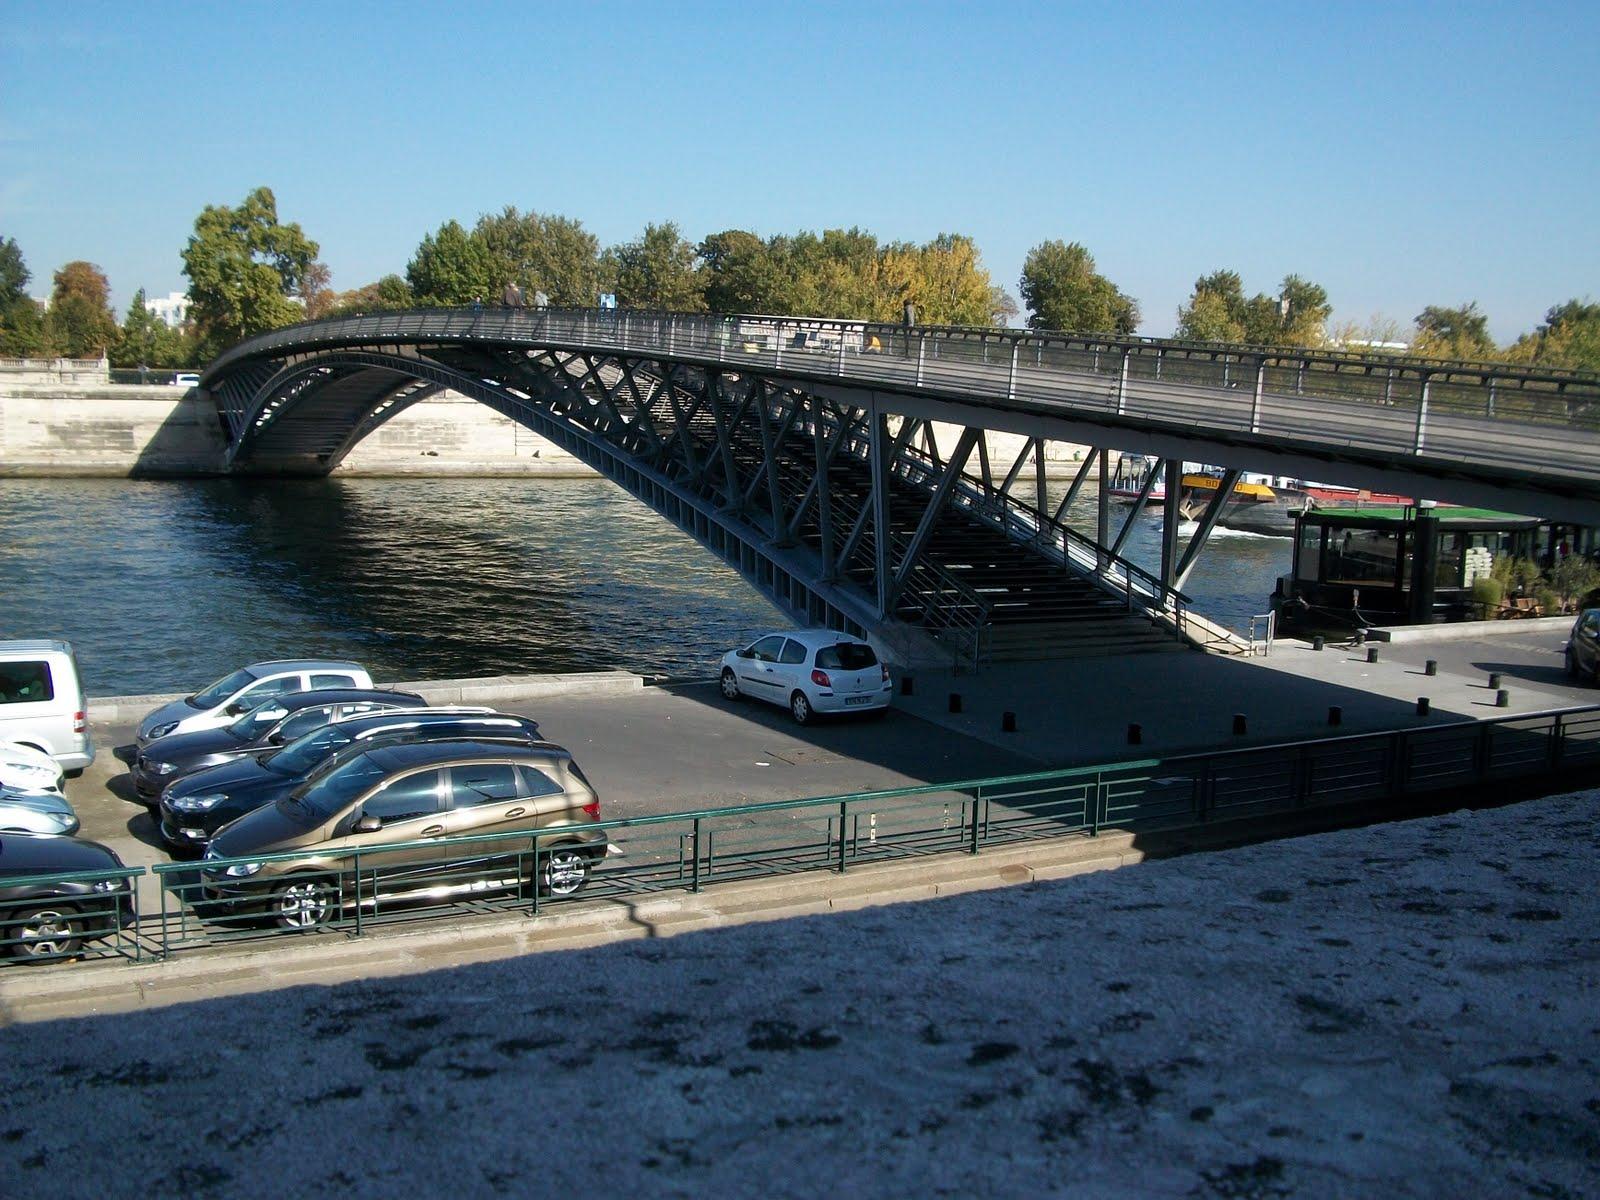 The final bridge of Paris we ll report on will be the Passerelle Leopold Sedar Senghor which is a footbridge over the Seine just next door to Pont de la